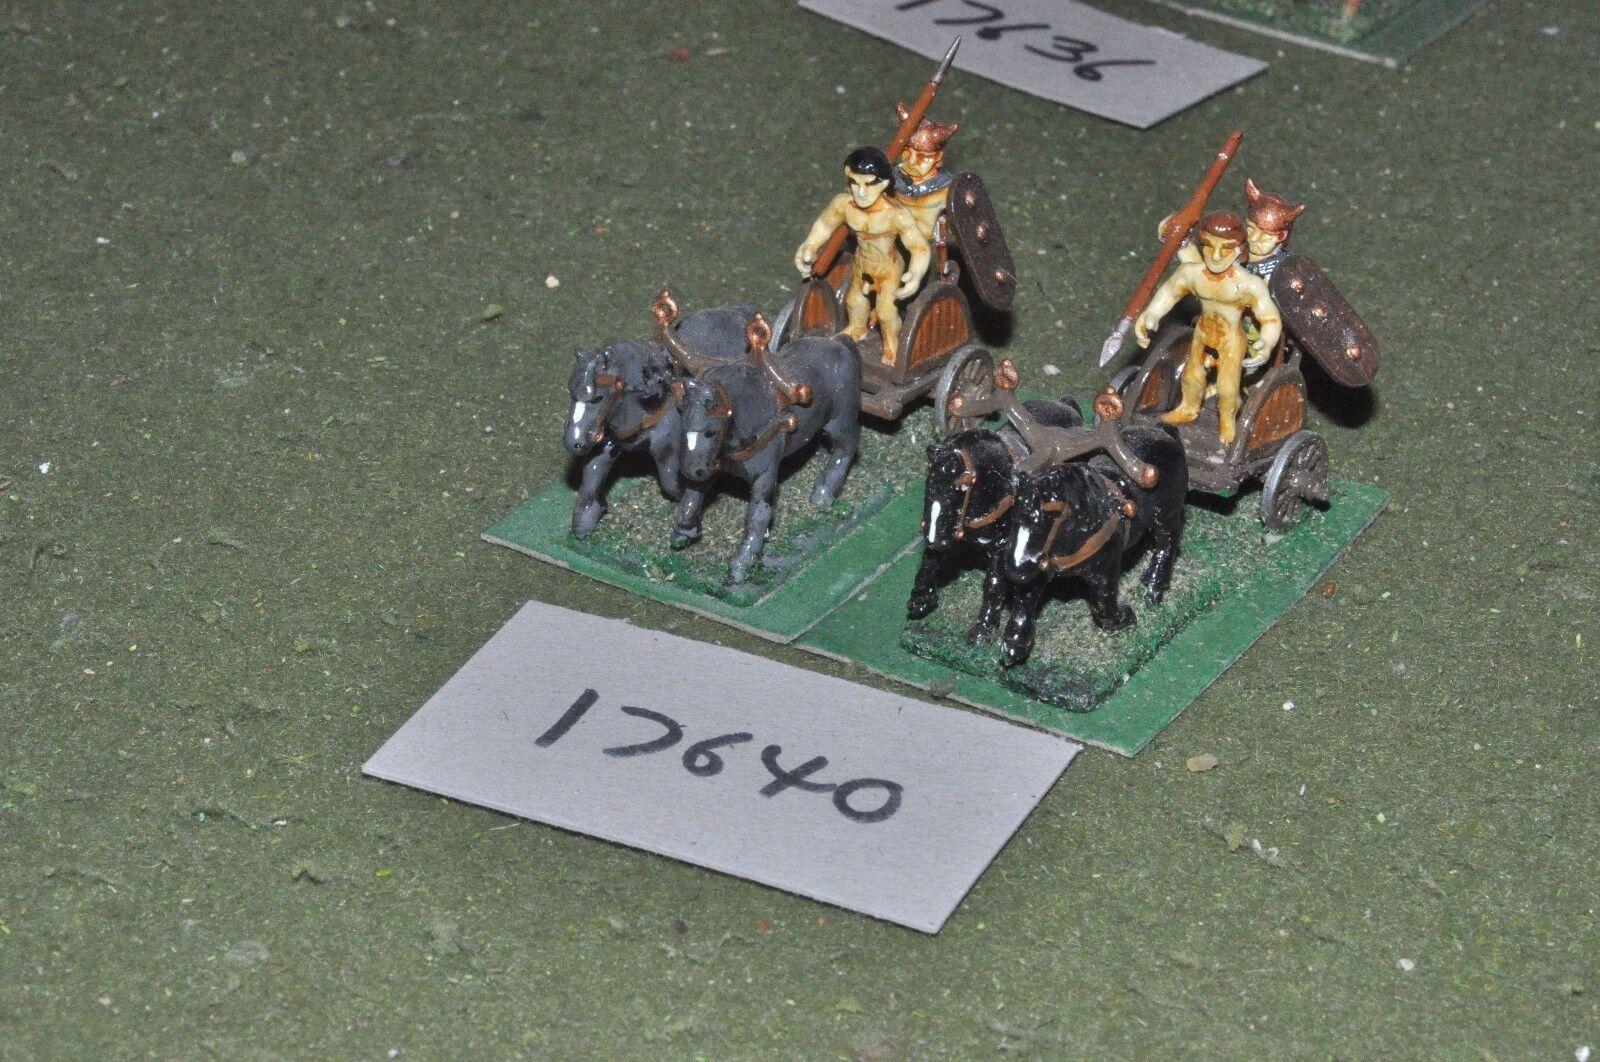 25mm roman era   gaul - gallic chariots 2 chariots - chariot (17640)